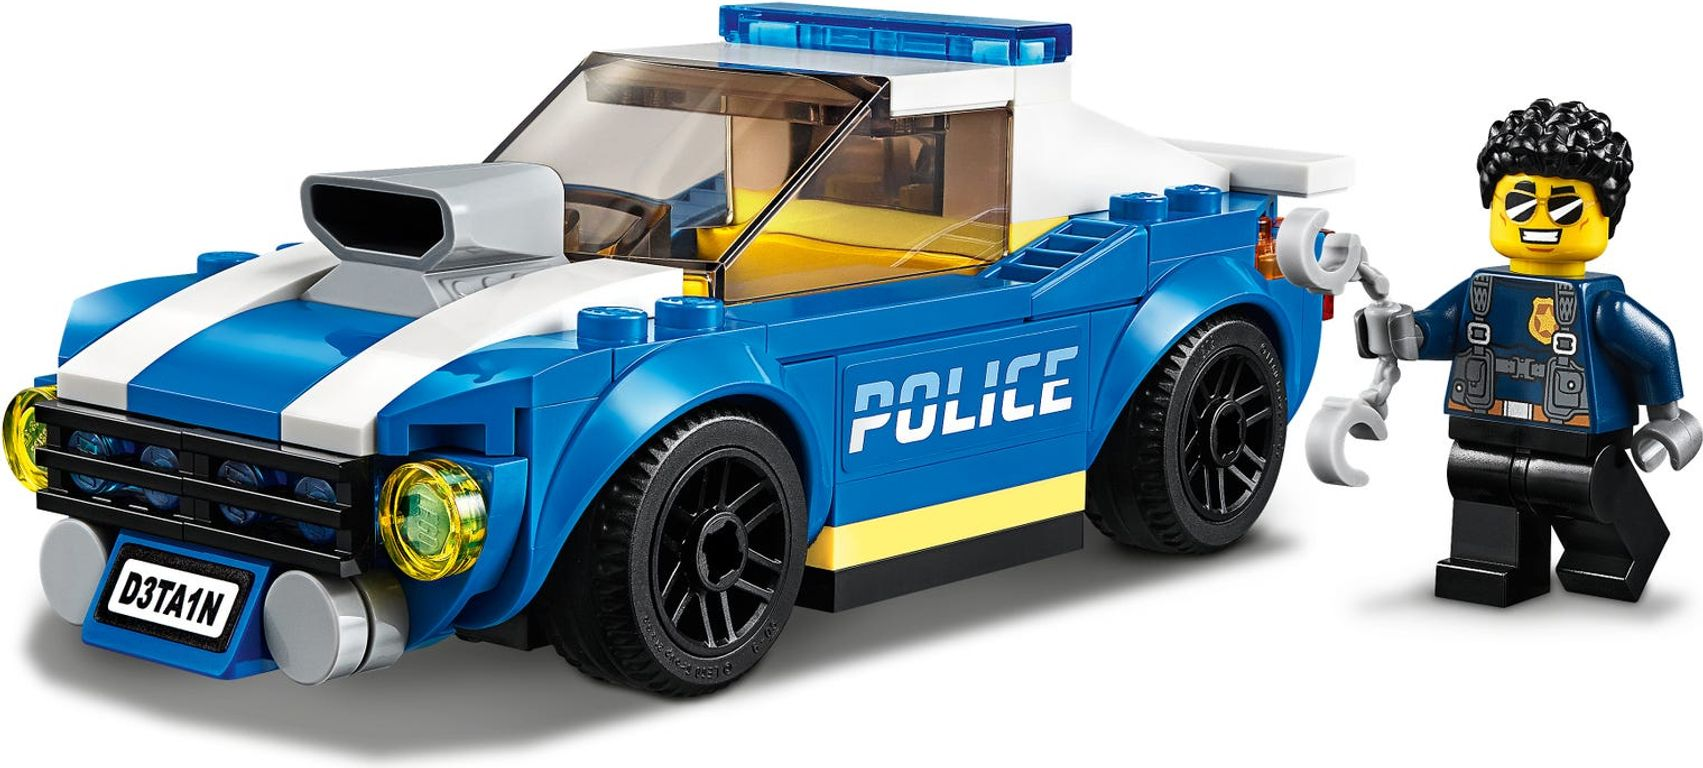 LEGO® City Police Highway Arrest minifigures